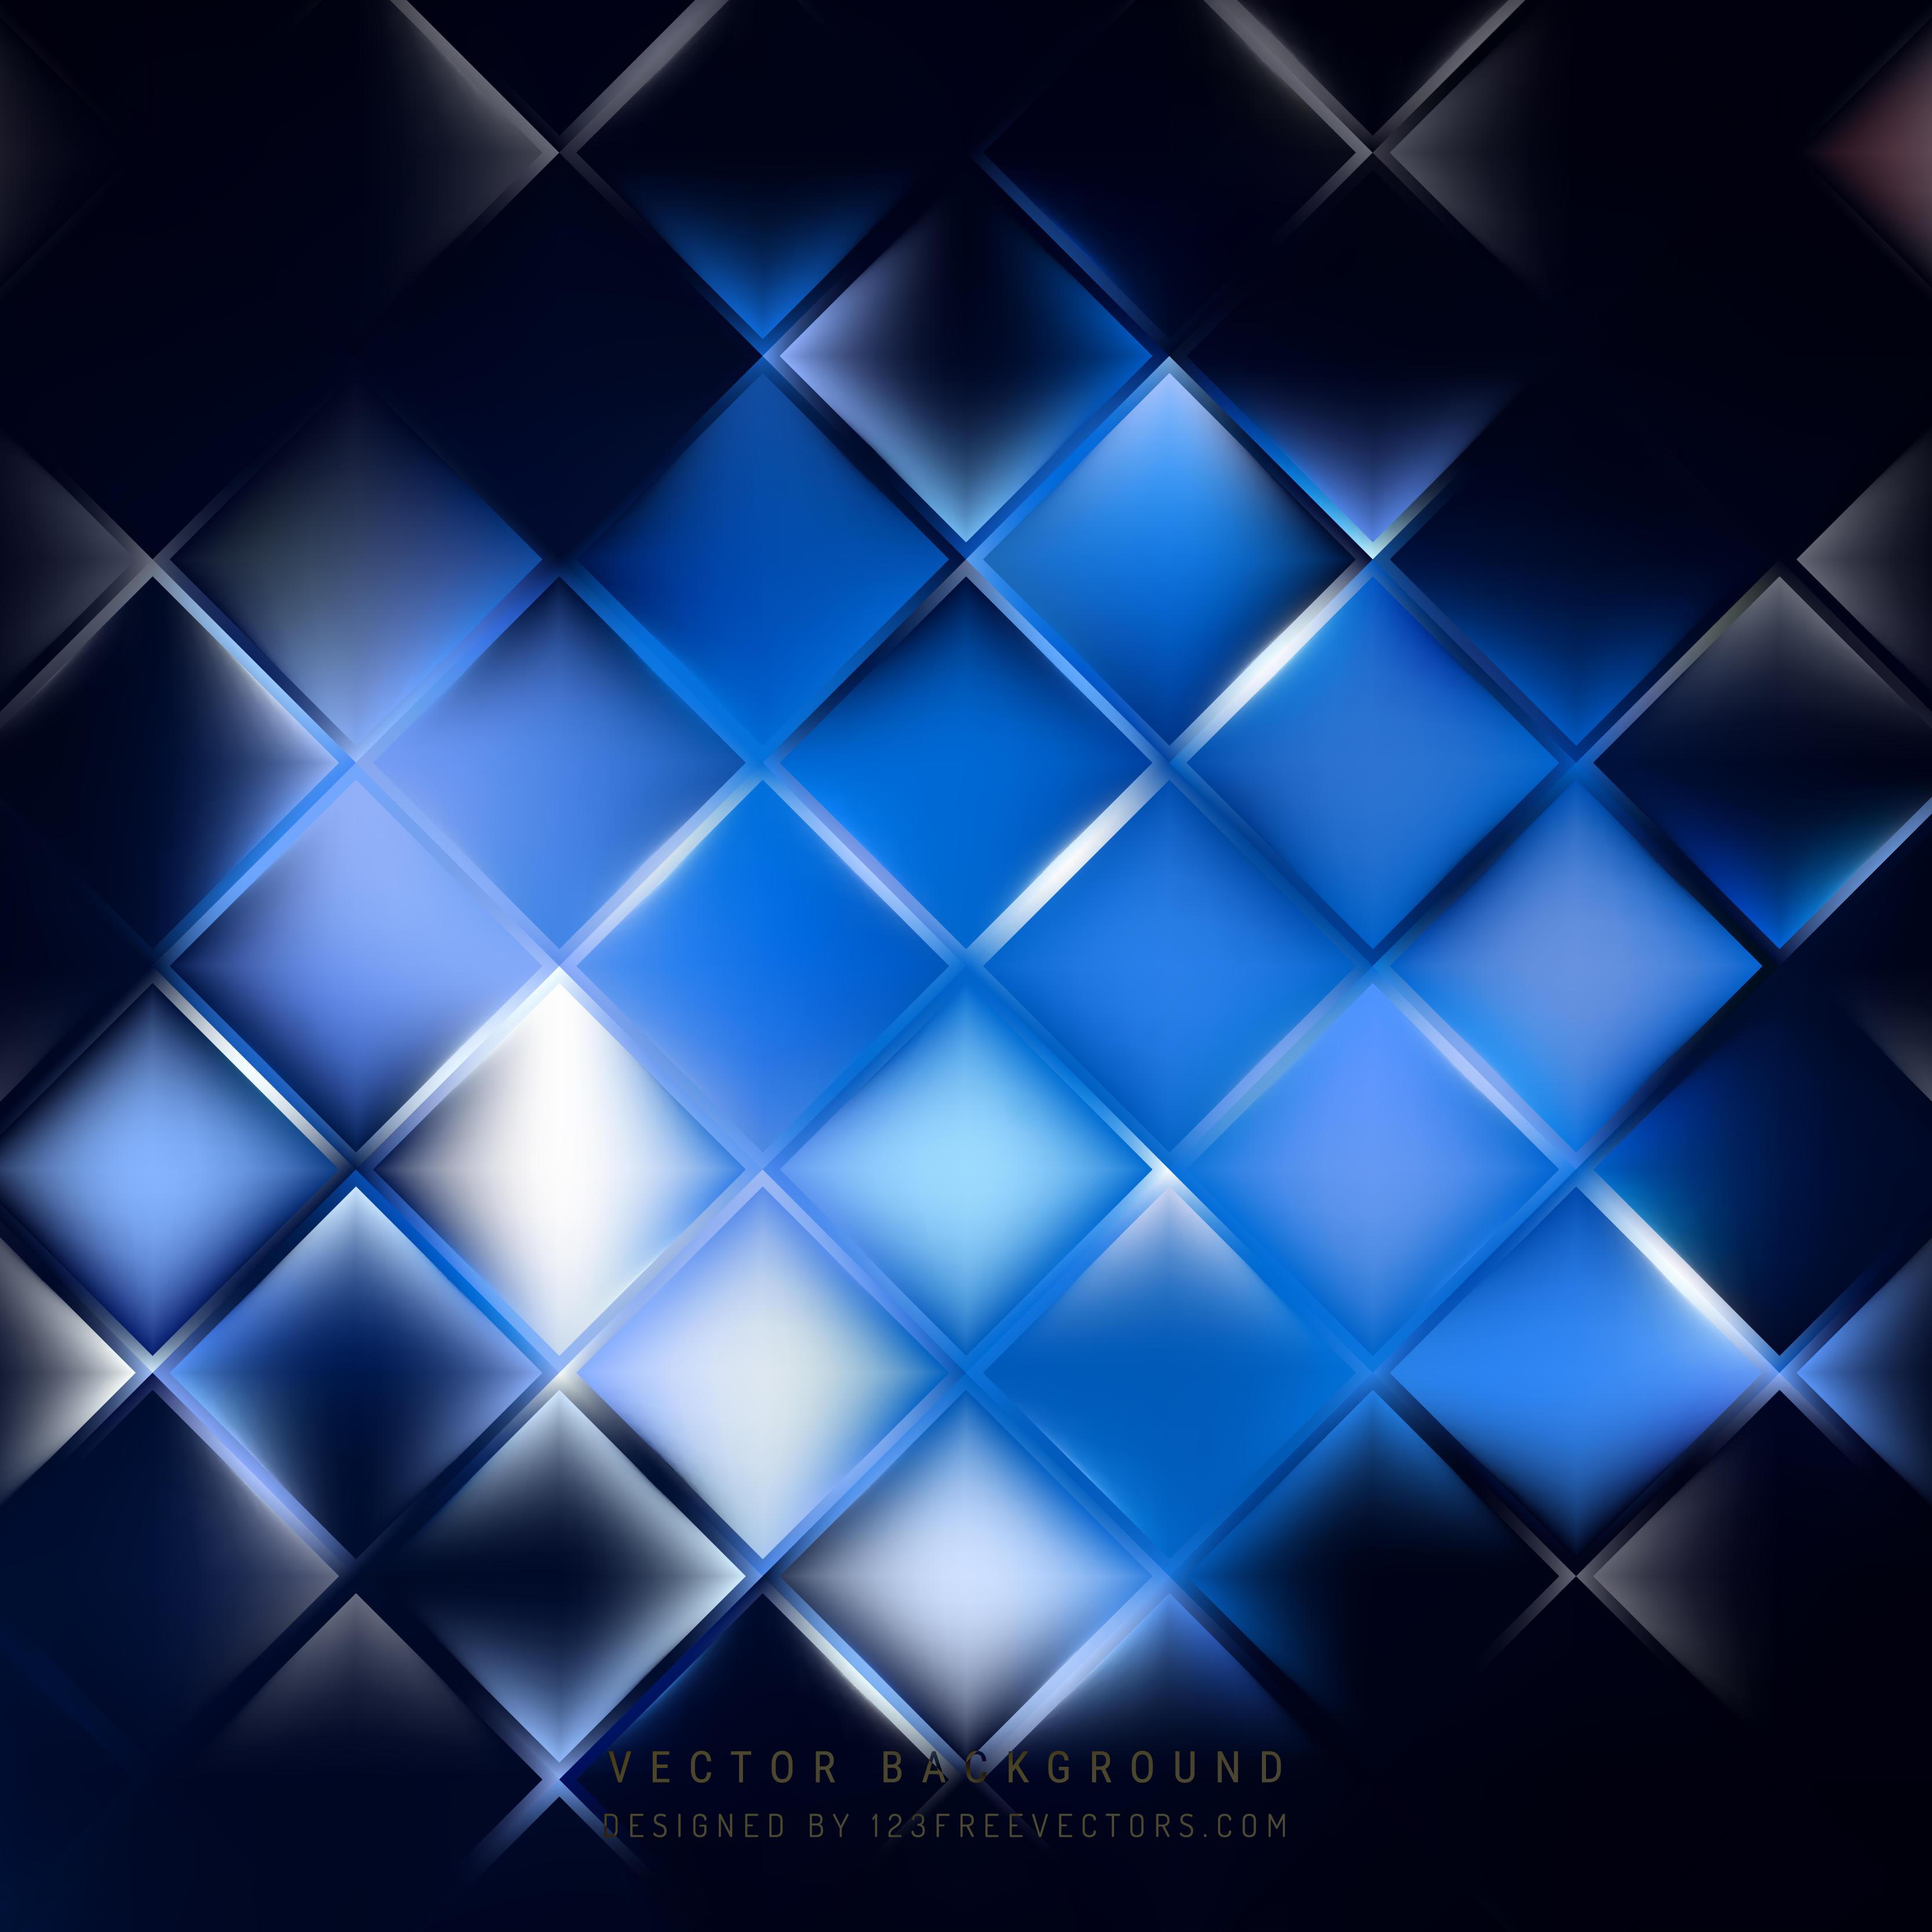 blue and black backgrounds baskanidaico